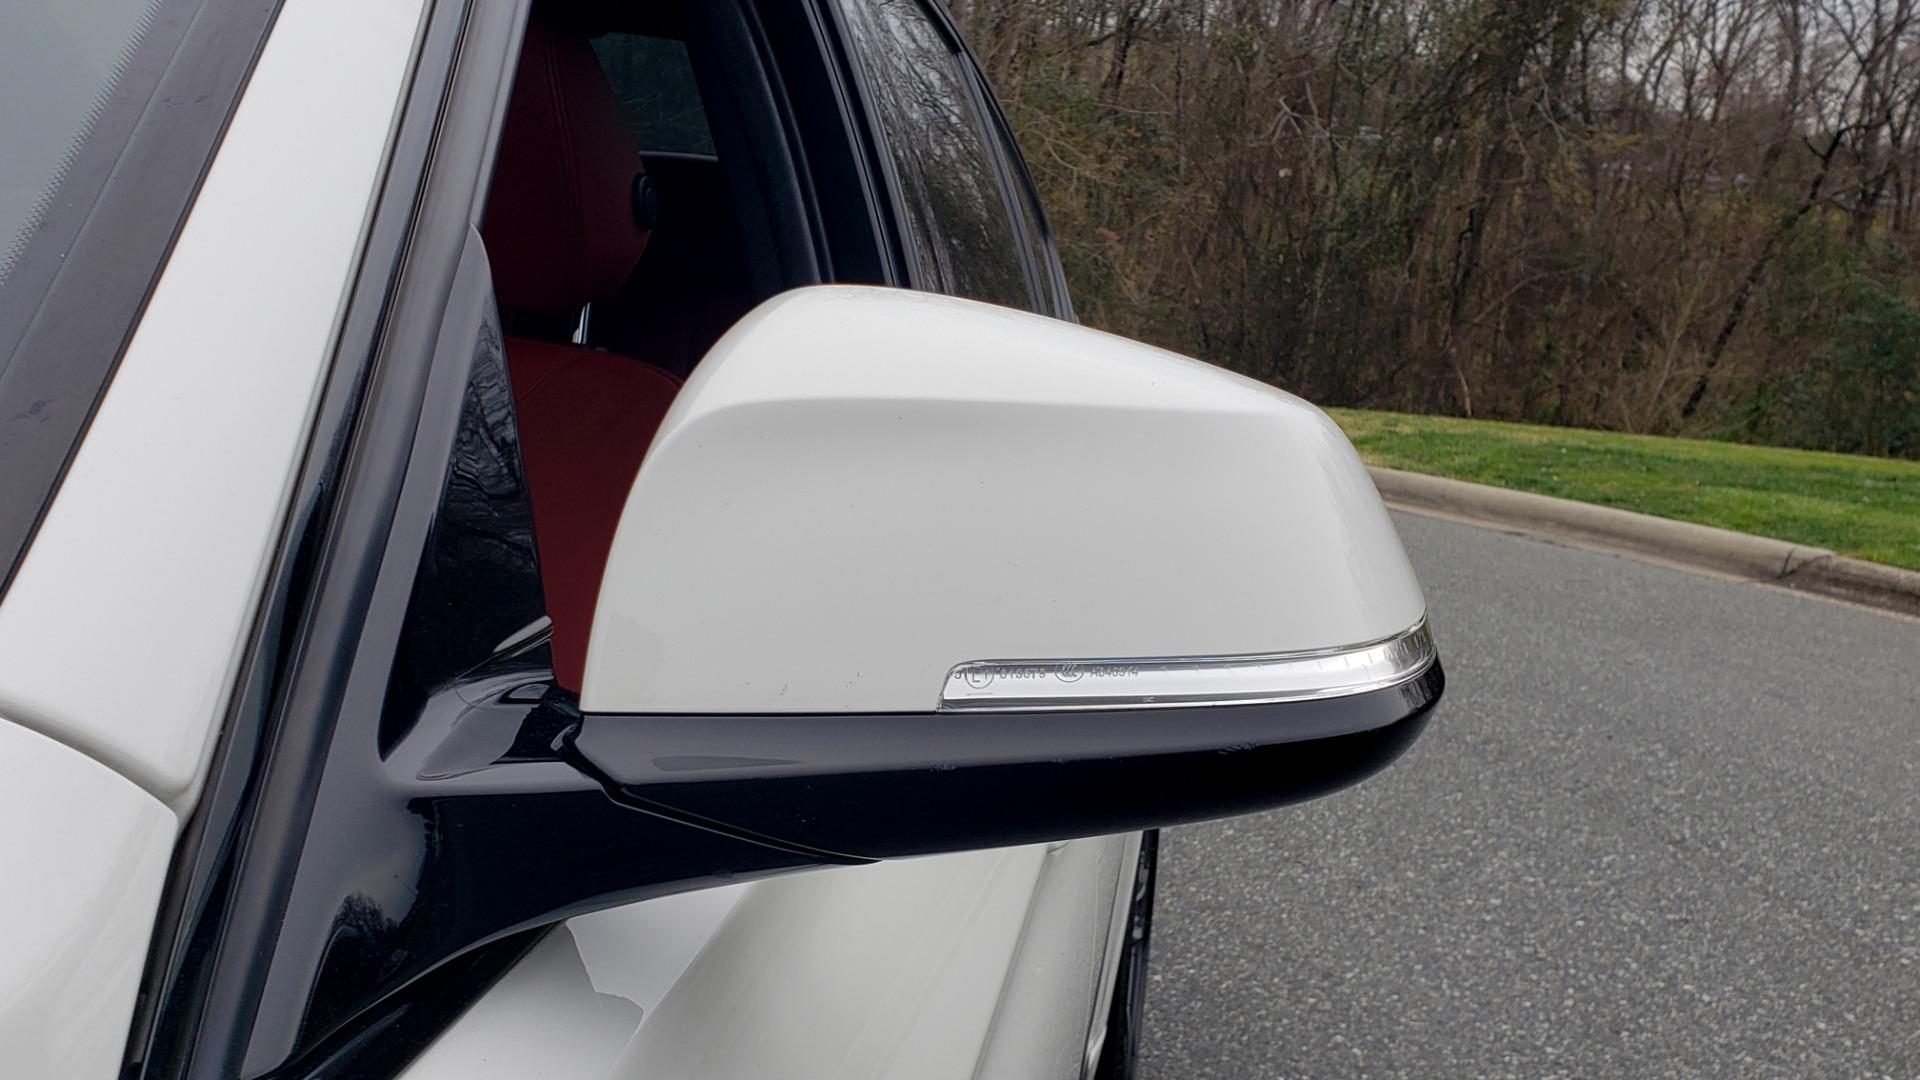 Used 2015 BMW 3 Series 335I M-SPORT / PREM PKG / HK SND / SUNROOF / REARVIEW for sale Sold at Formula Imports in Charlotte NC 28227 26